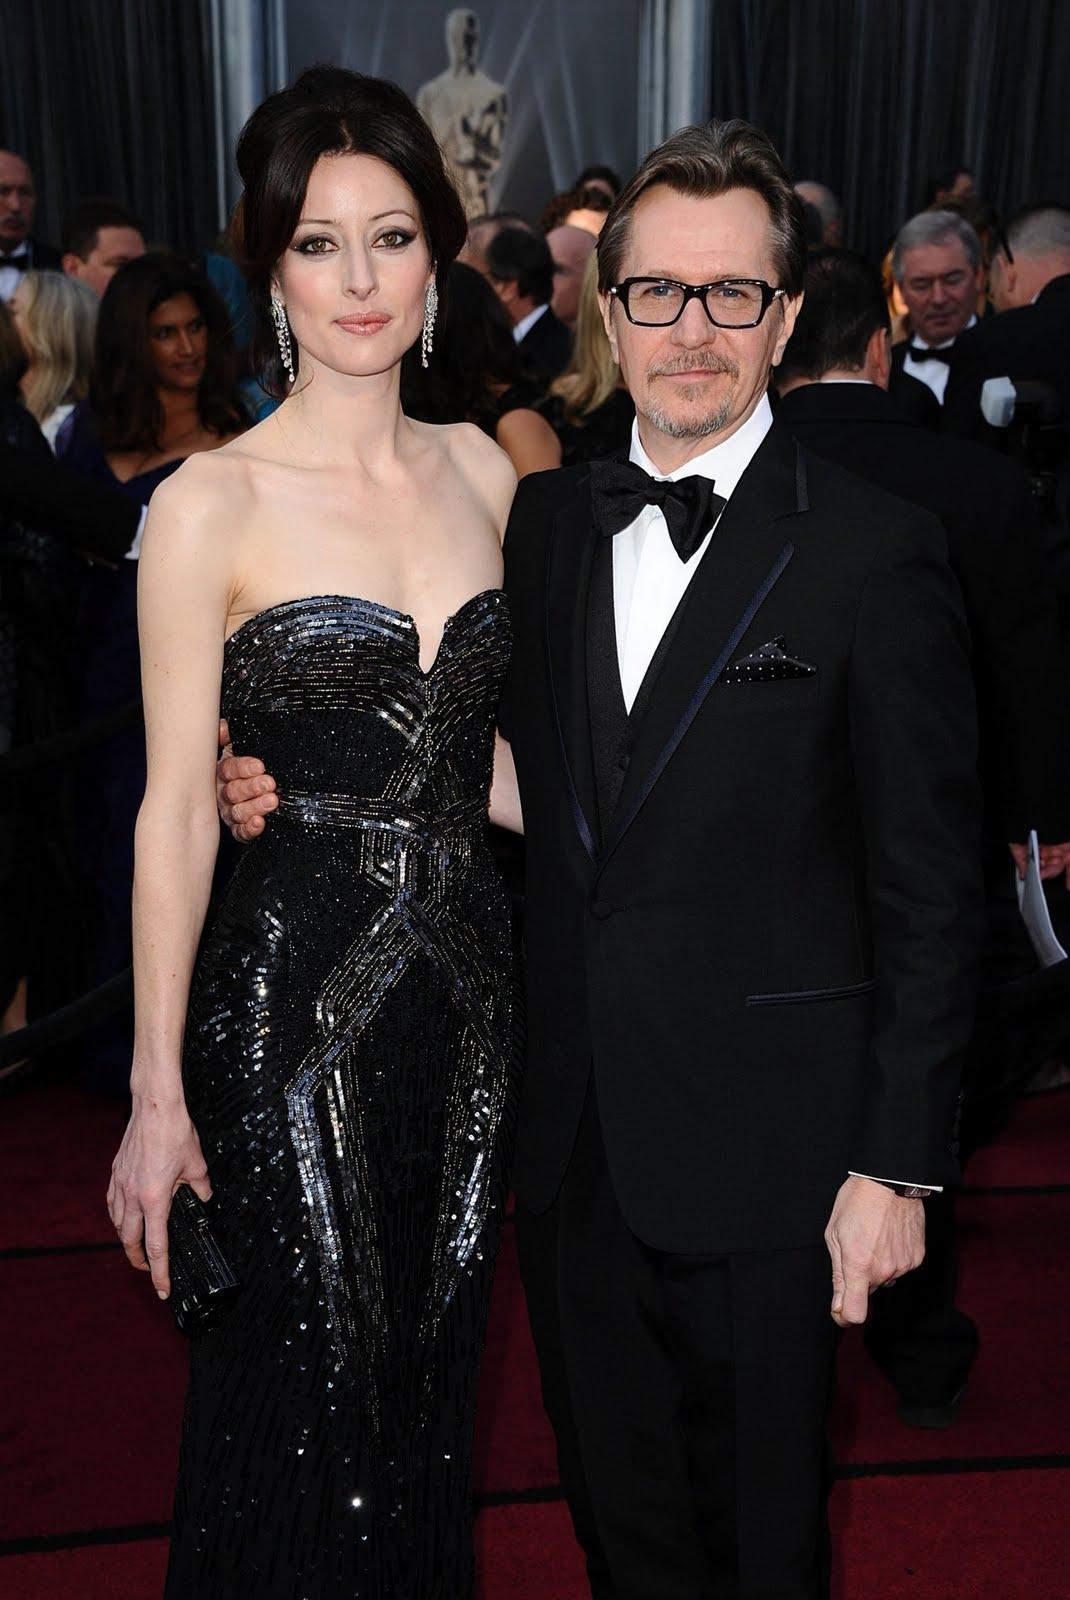 http://4.bp.blogspot.com/-gTW903dHTKA/T0r6ezEIJGI/AAAAAAAAk1s/32eyBLMRYg0/s1600/Gary+Oldman+%2526+his+wife+Alexandra+-+2012+Oscars.jpg